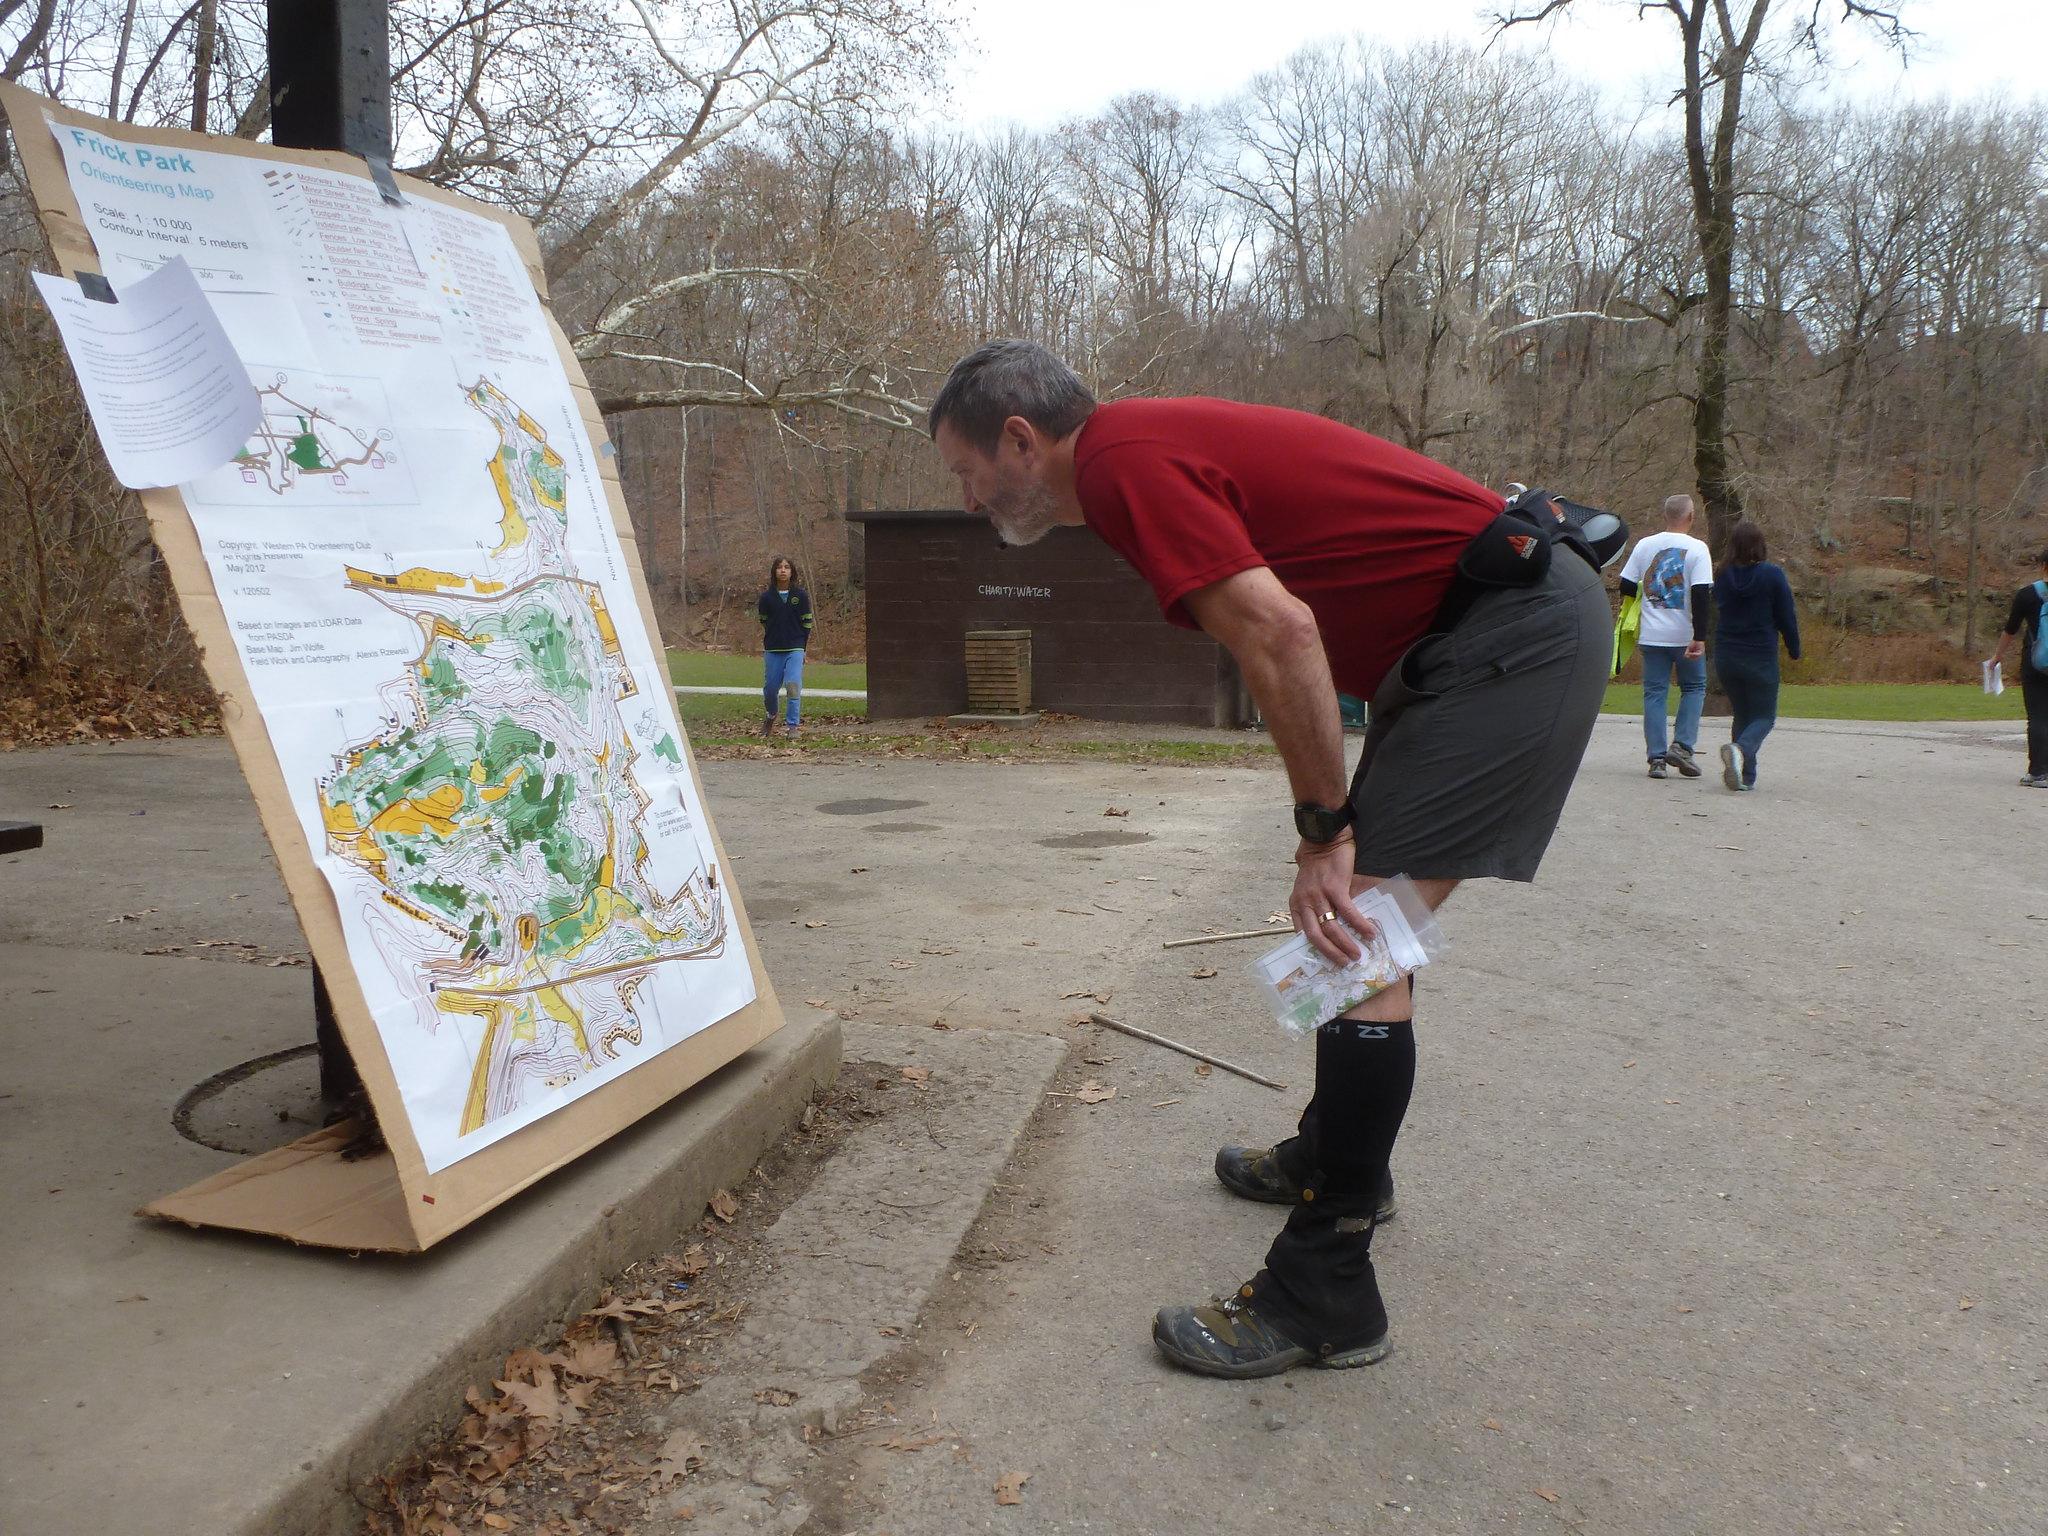 WPOC Orienteering Frick Park 2012